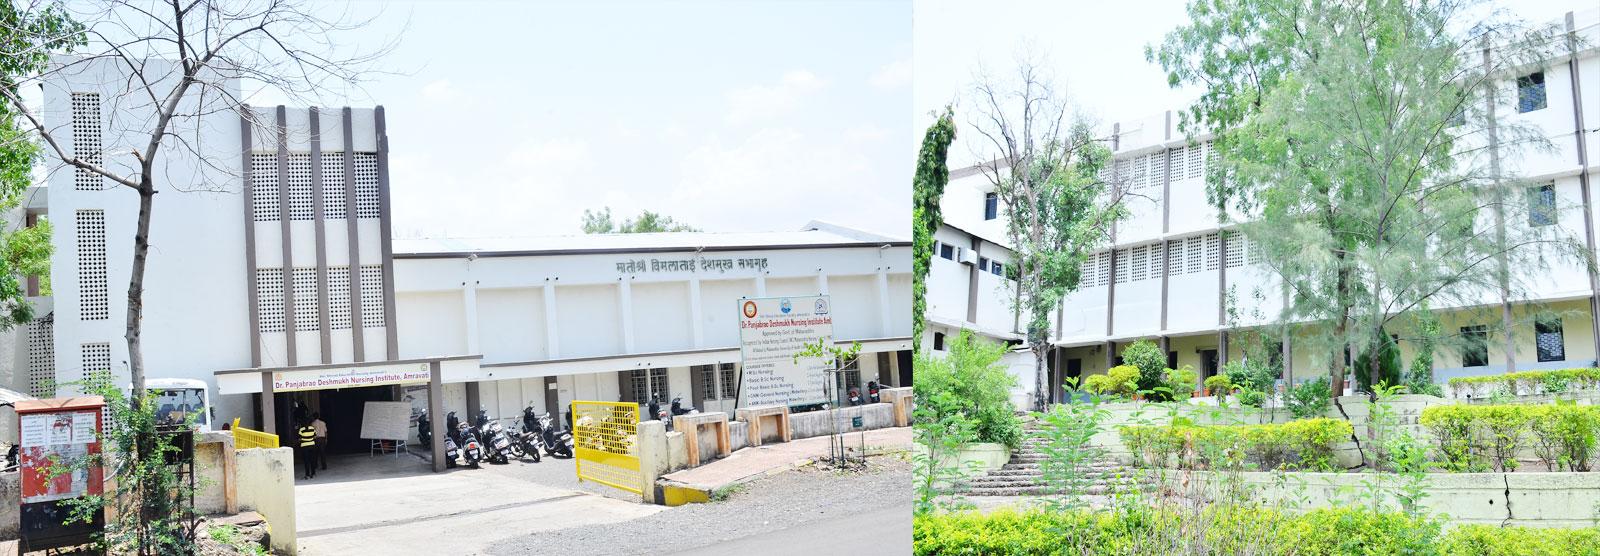 Dr. Panjabrao Deshmukh Nursing Institute, Amravati